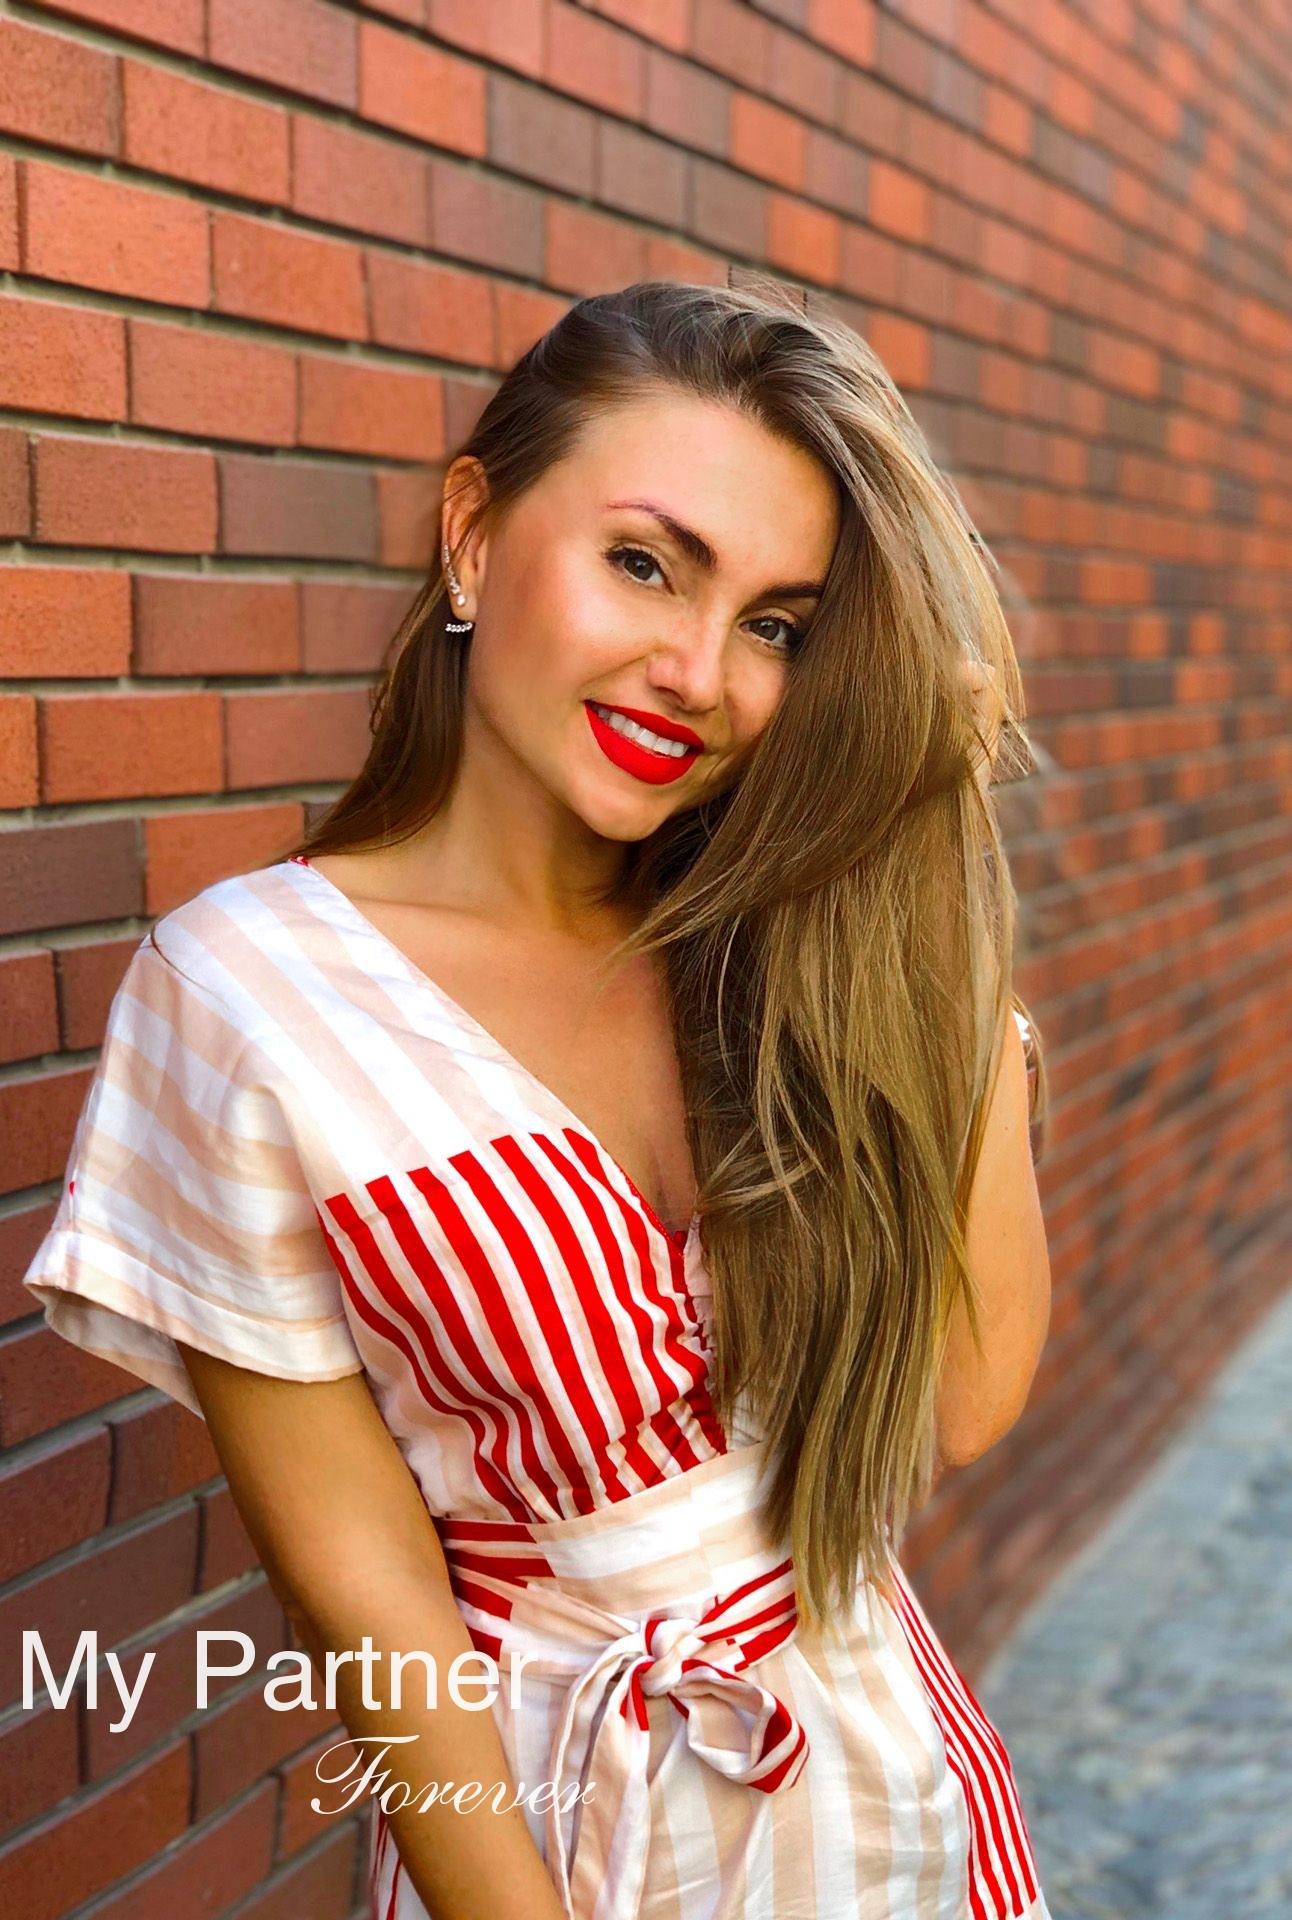 Meet Gorgeous Ukrainian Girl Bogdana from Dniepropetrovsk, Ukraine